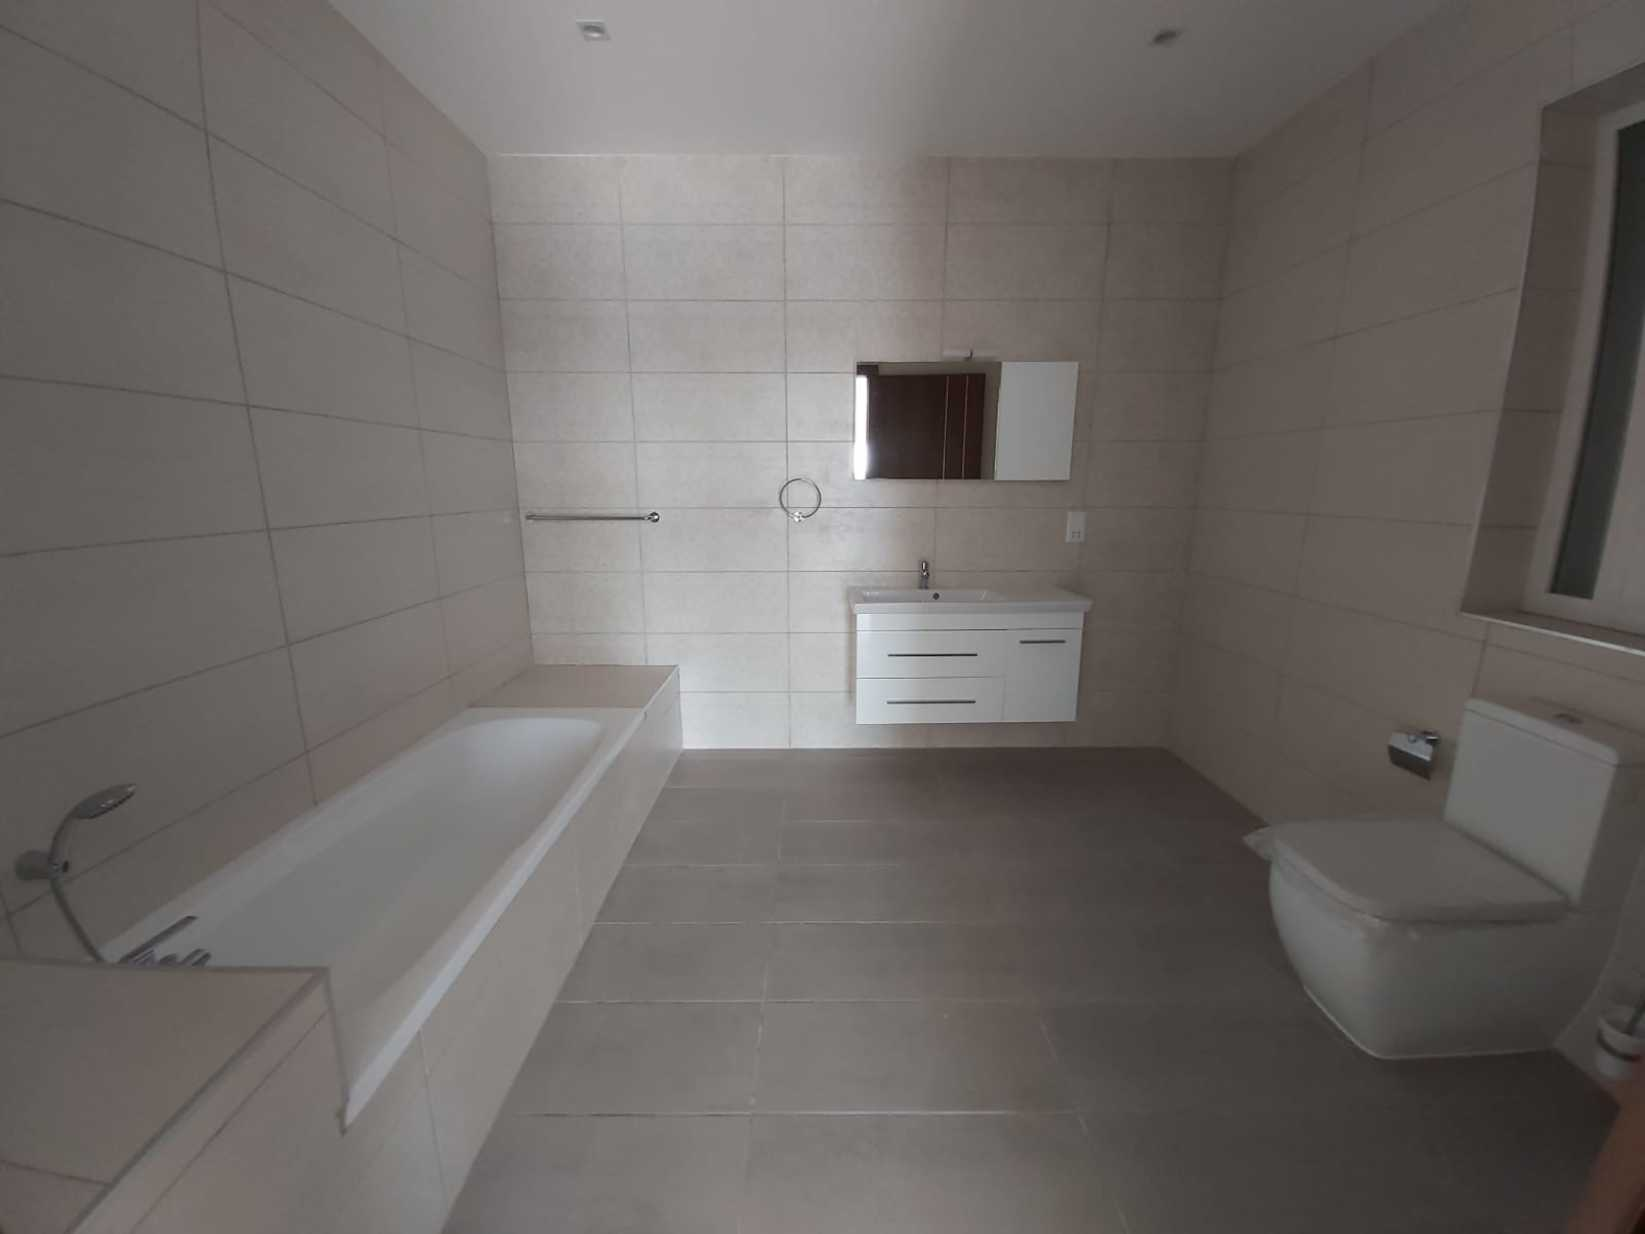 3 bed Apartment For Sale in Qawra, Qawra - thumb 12